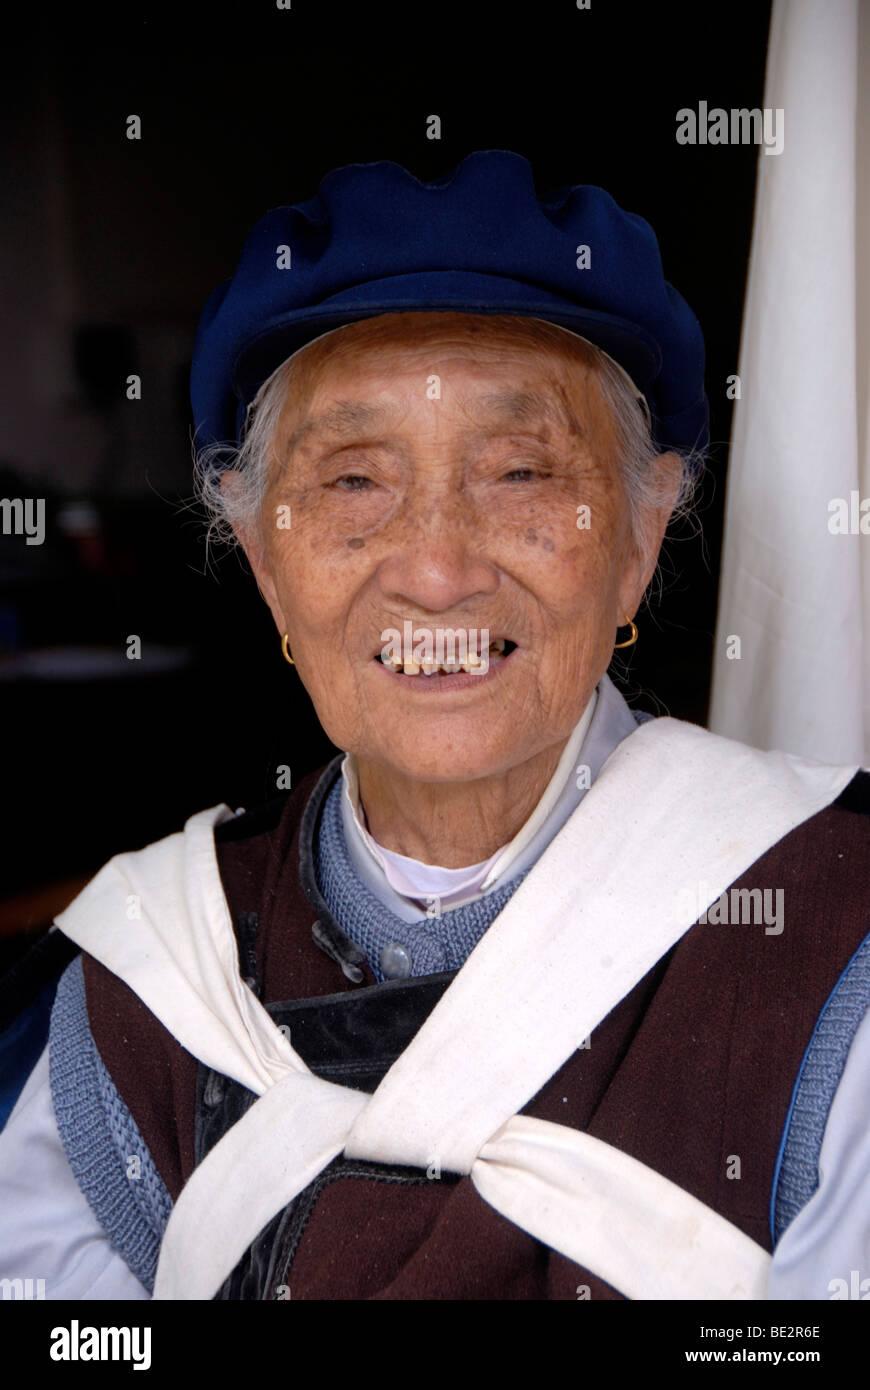 Frauen der ethnischen Gruppe der Naxi in Tracht, UNESCO-Weltkulturerbe, Portrait, Ethnologie, Halloween, Lijiang, Stockbild